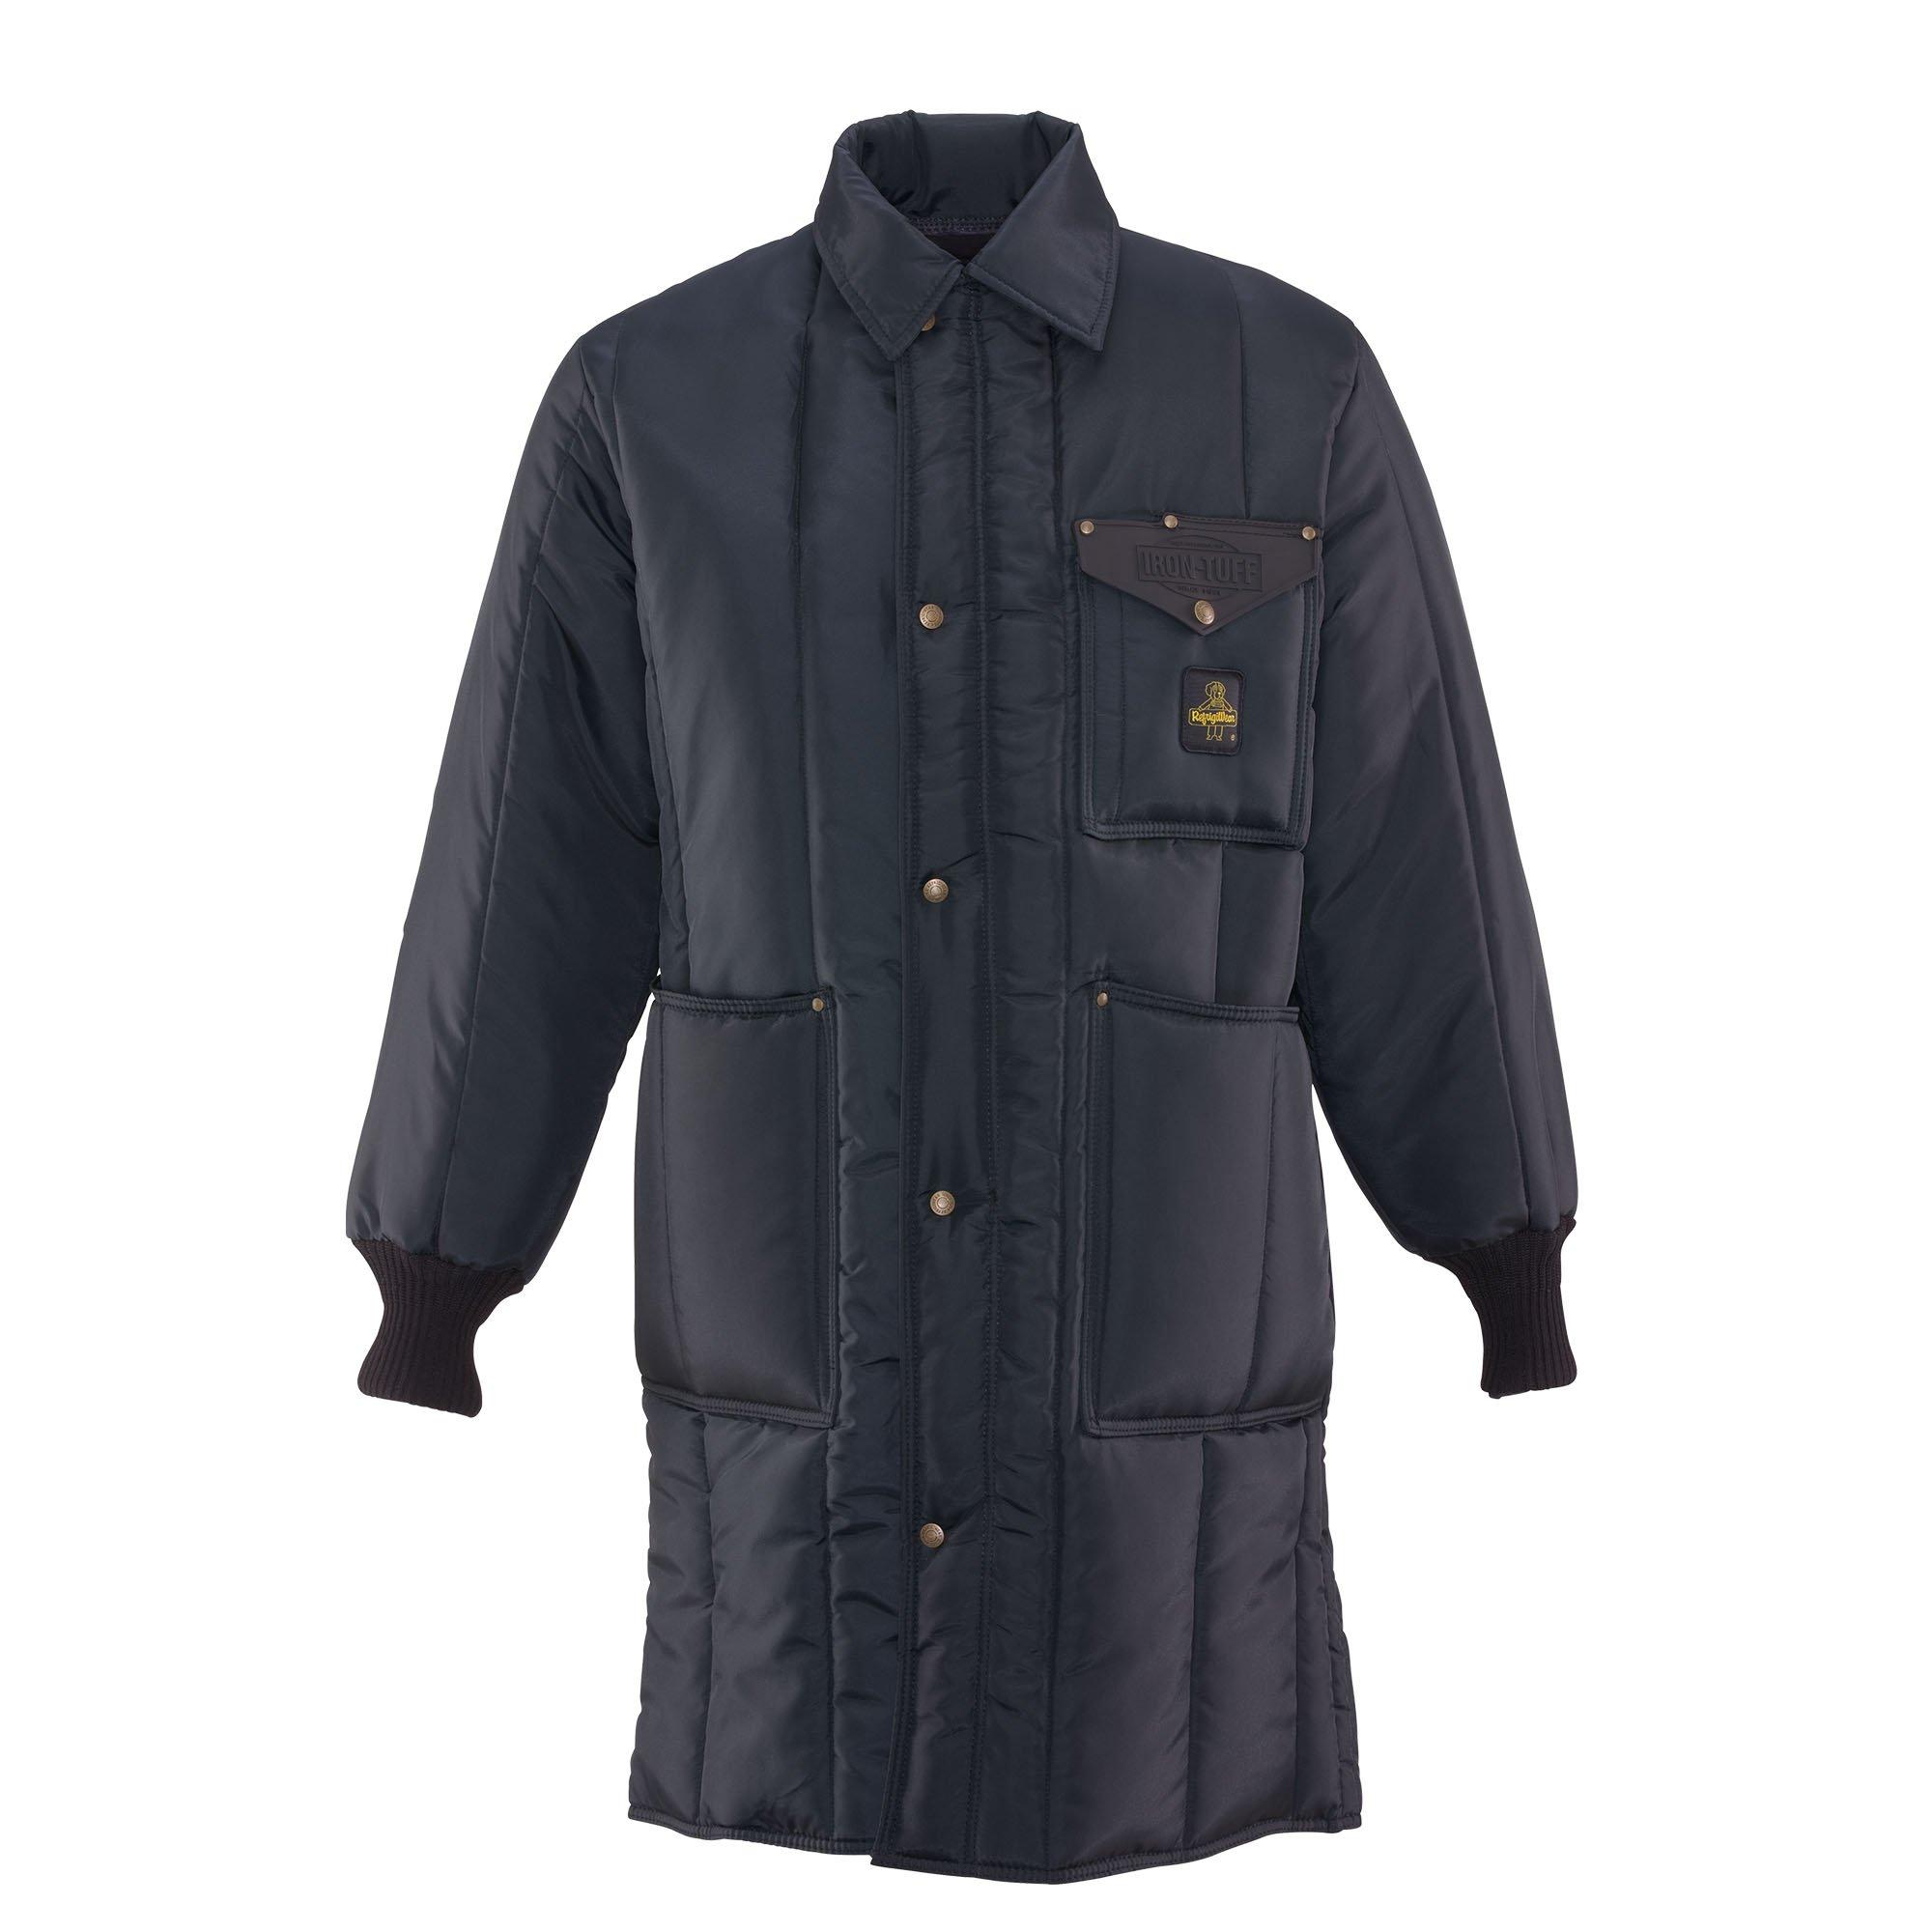 RefrigiWear Men's Iron-Tuff Inspector Coat, Navy 2XL